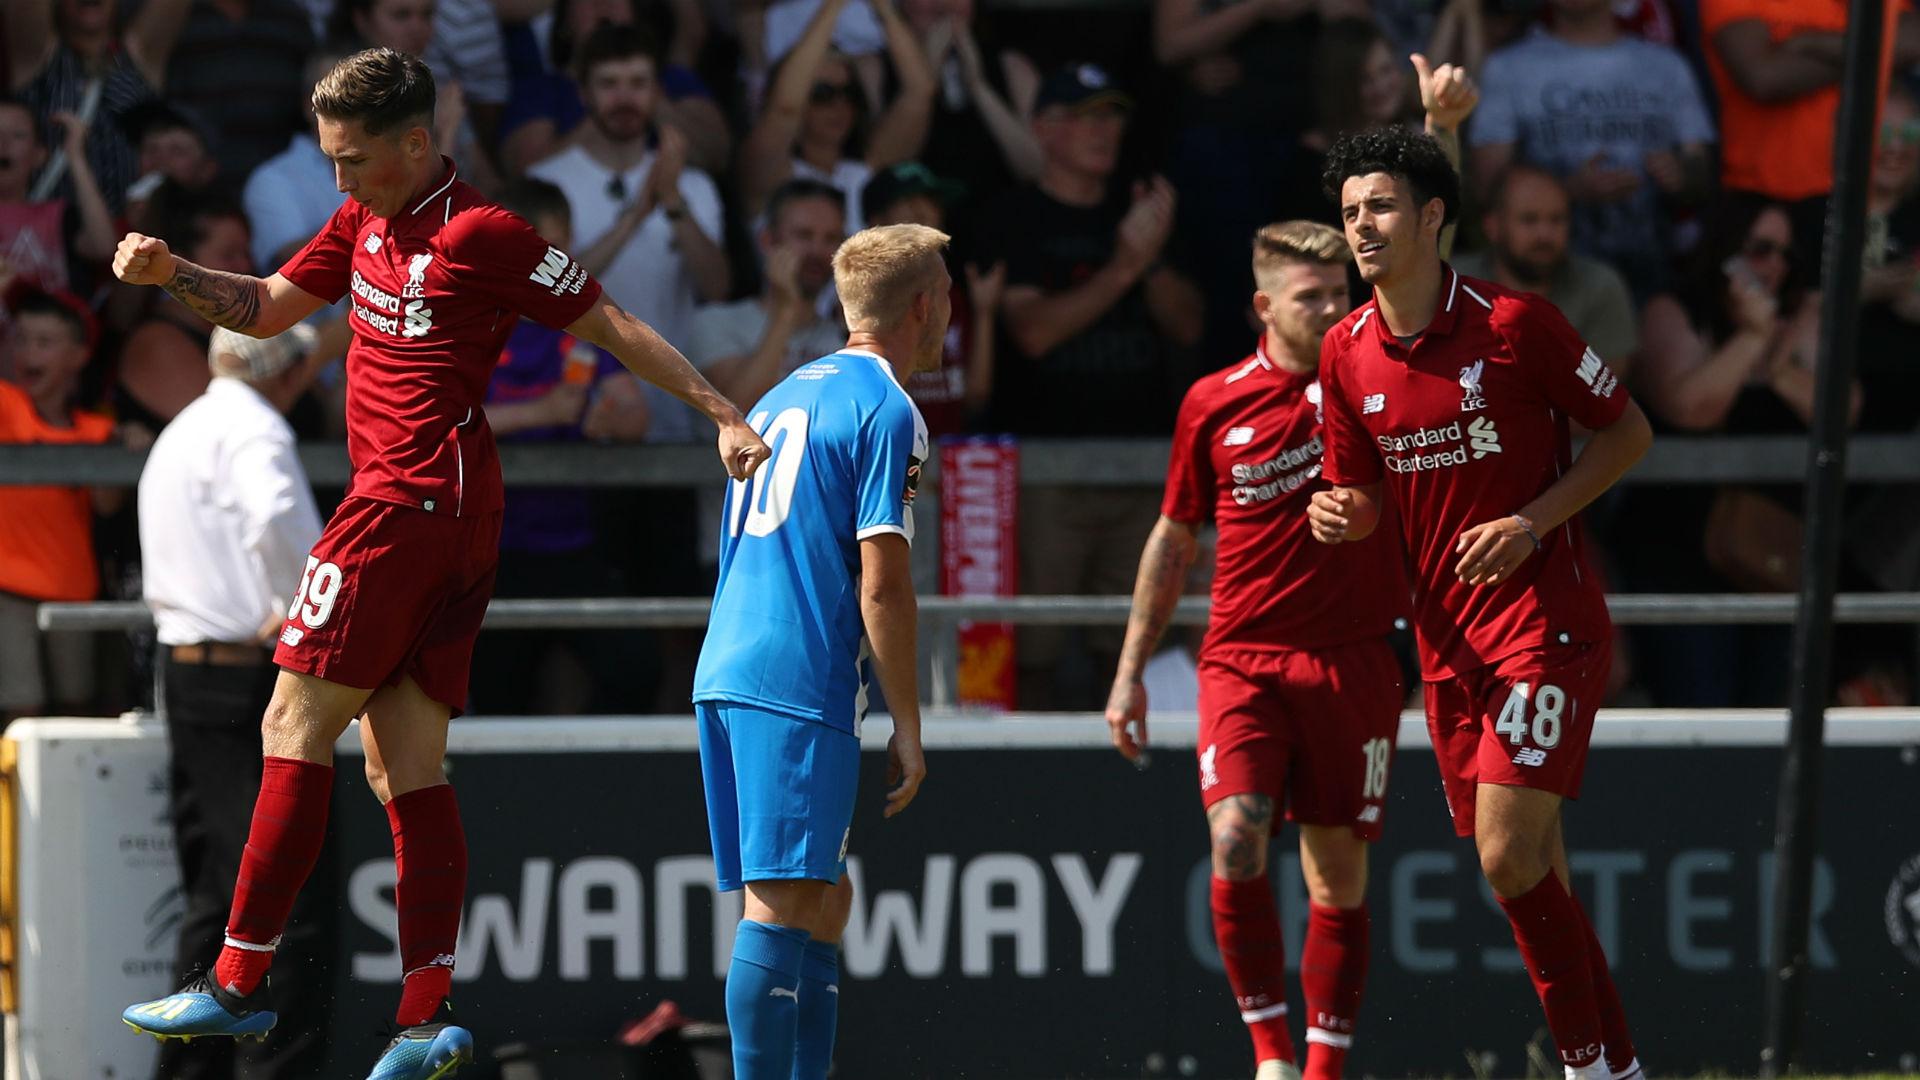 Harry Wilson scores for Liverpool